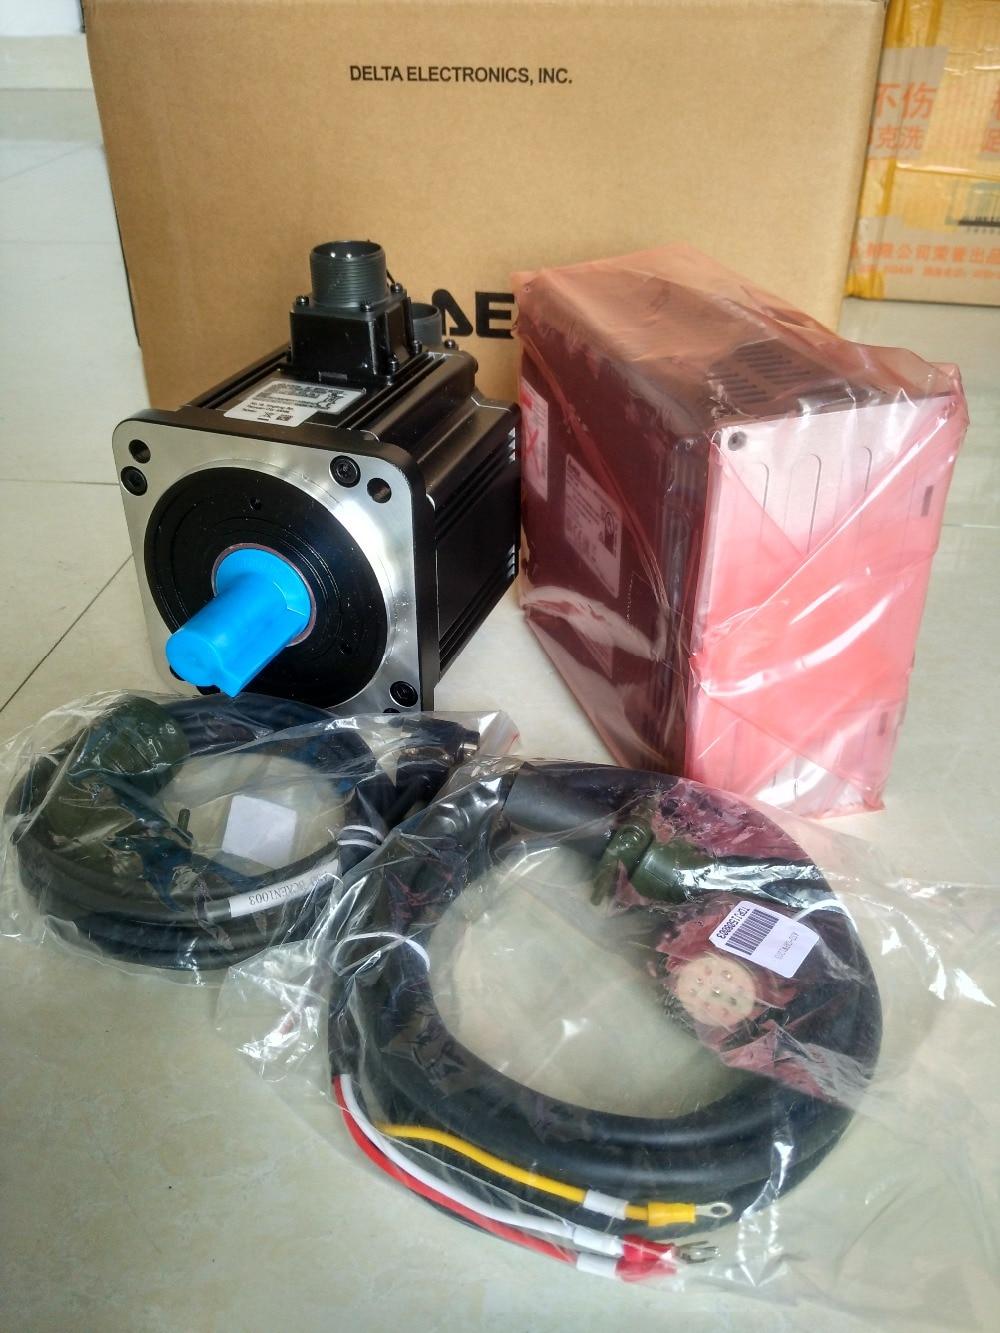 ASD-B2-1021-B+ECMA-G21309RS Delta 130mm 220v 900w 8.59NM 1000rpm 17bit AC servo motor&drive kit&3m cable запонки arcadio rossi 2 b 1021 40 s